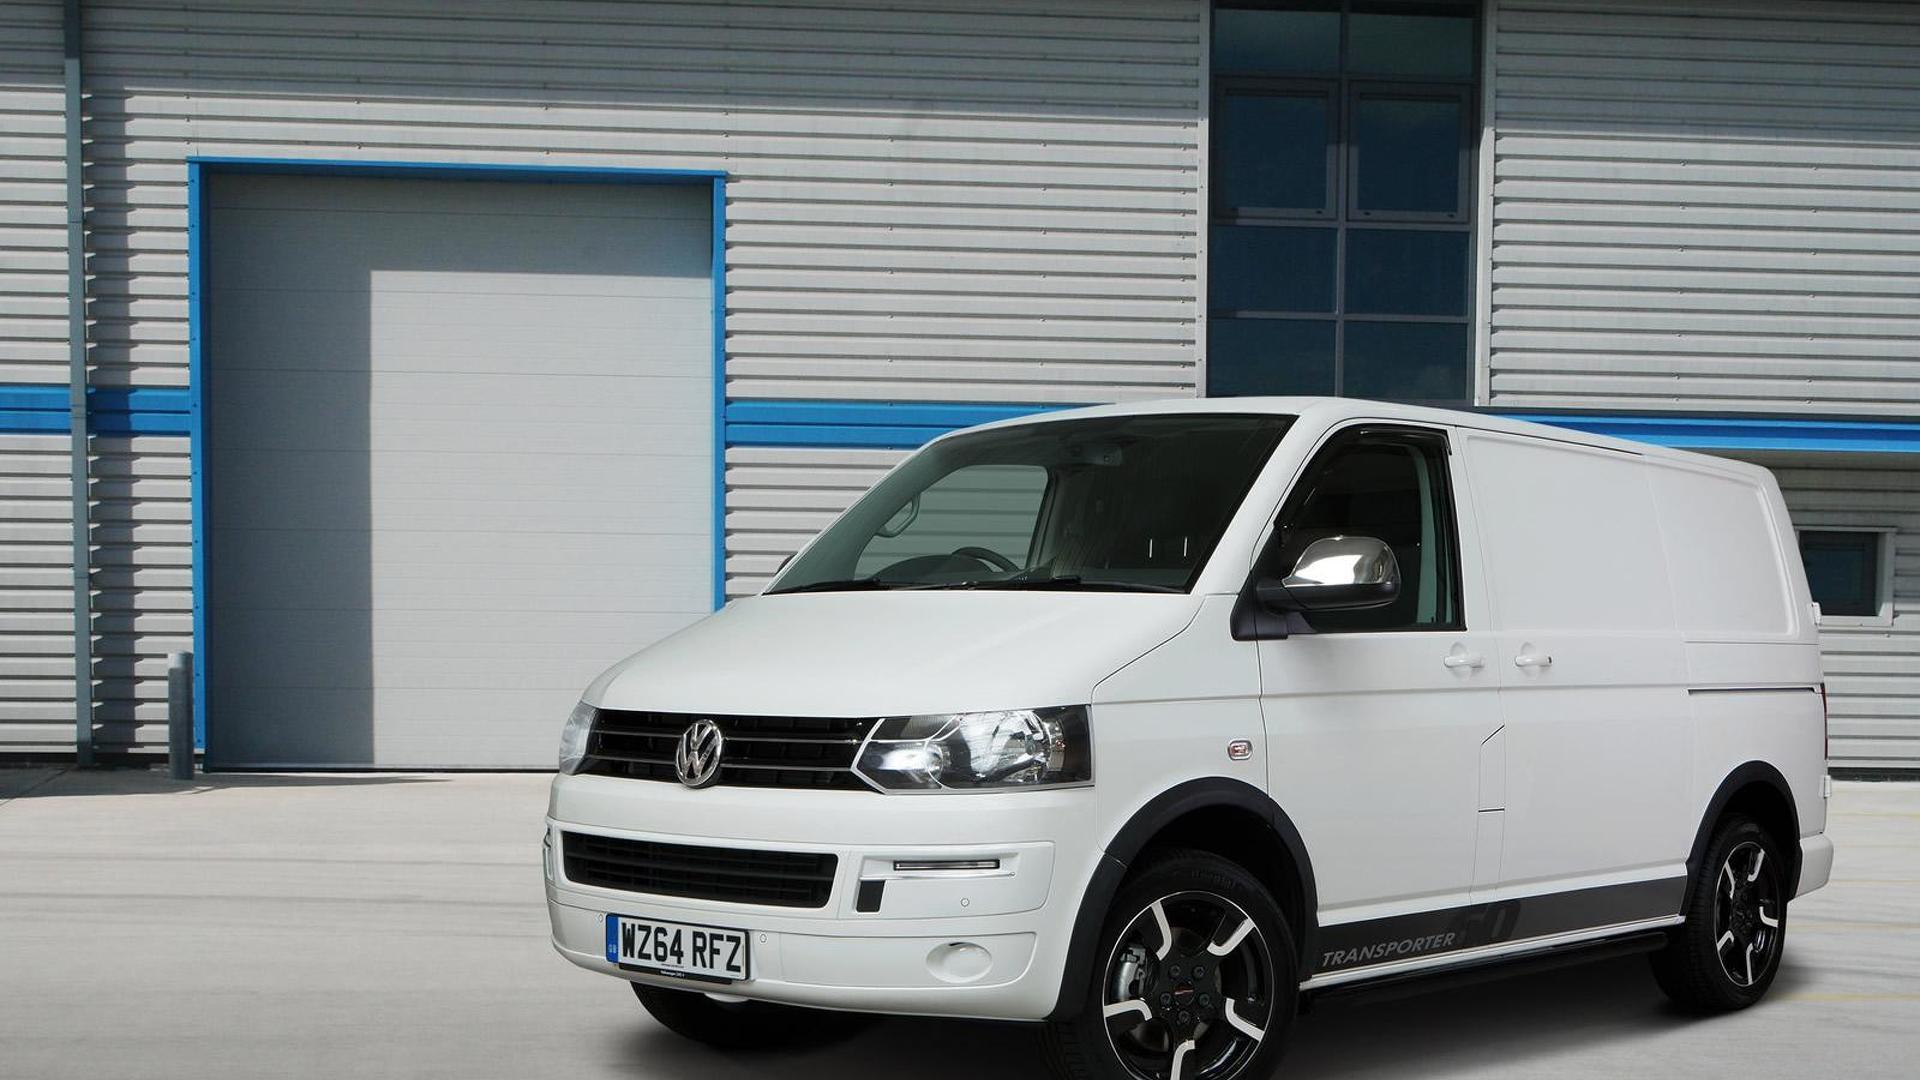 Фото | Volkswagen T5 60 Anniversary Pack